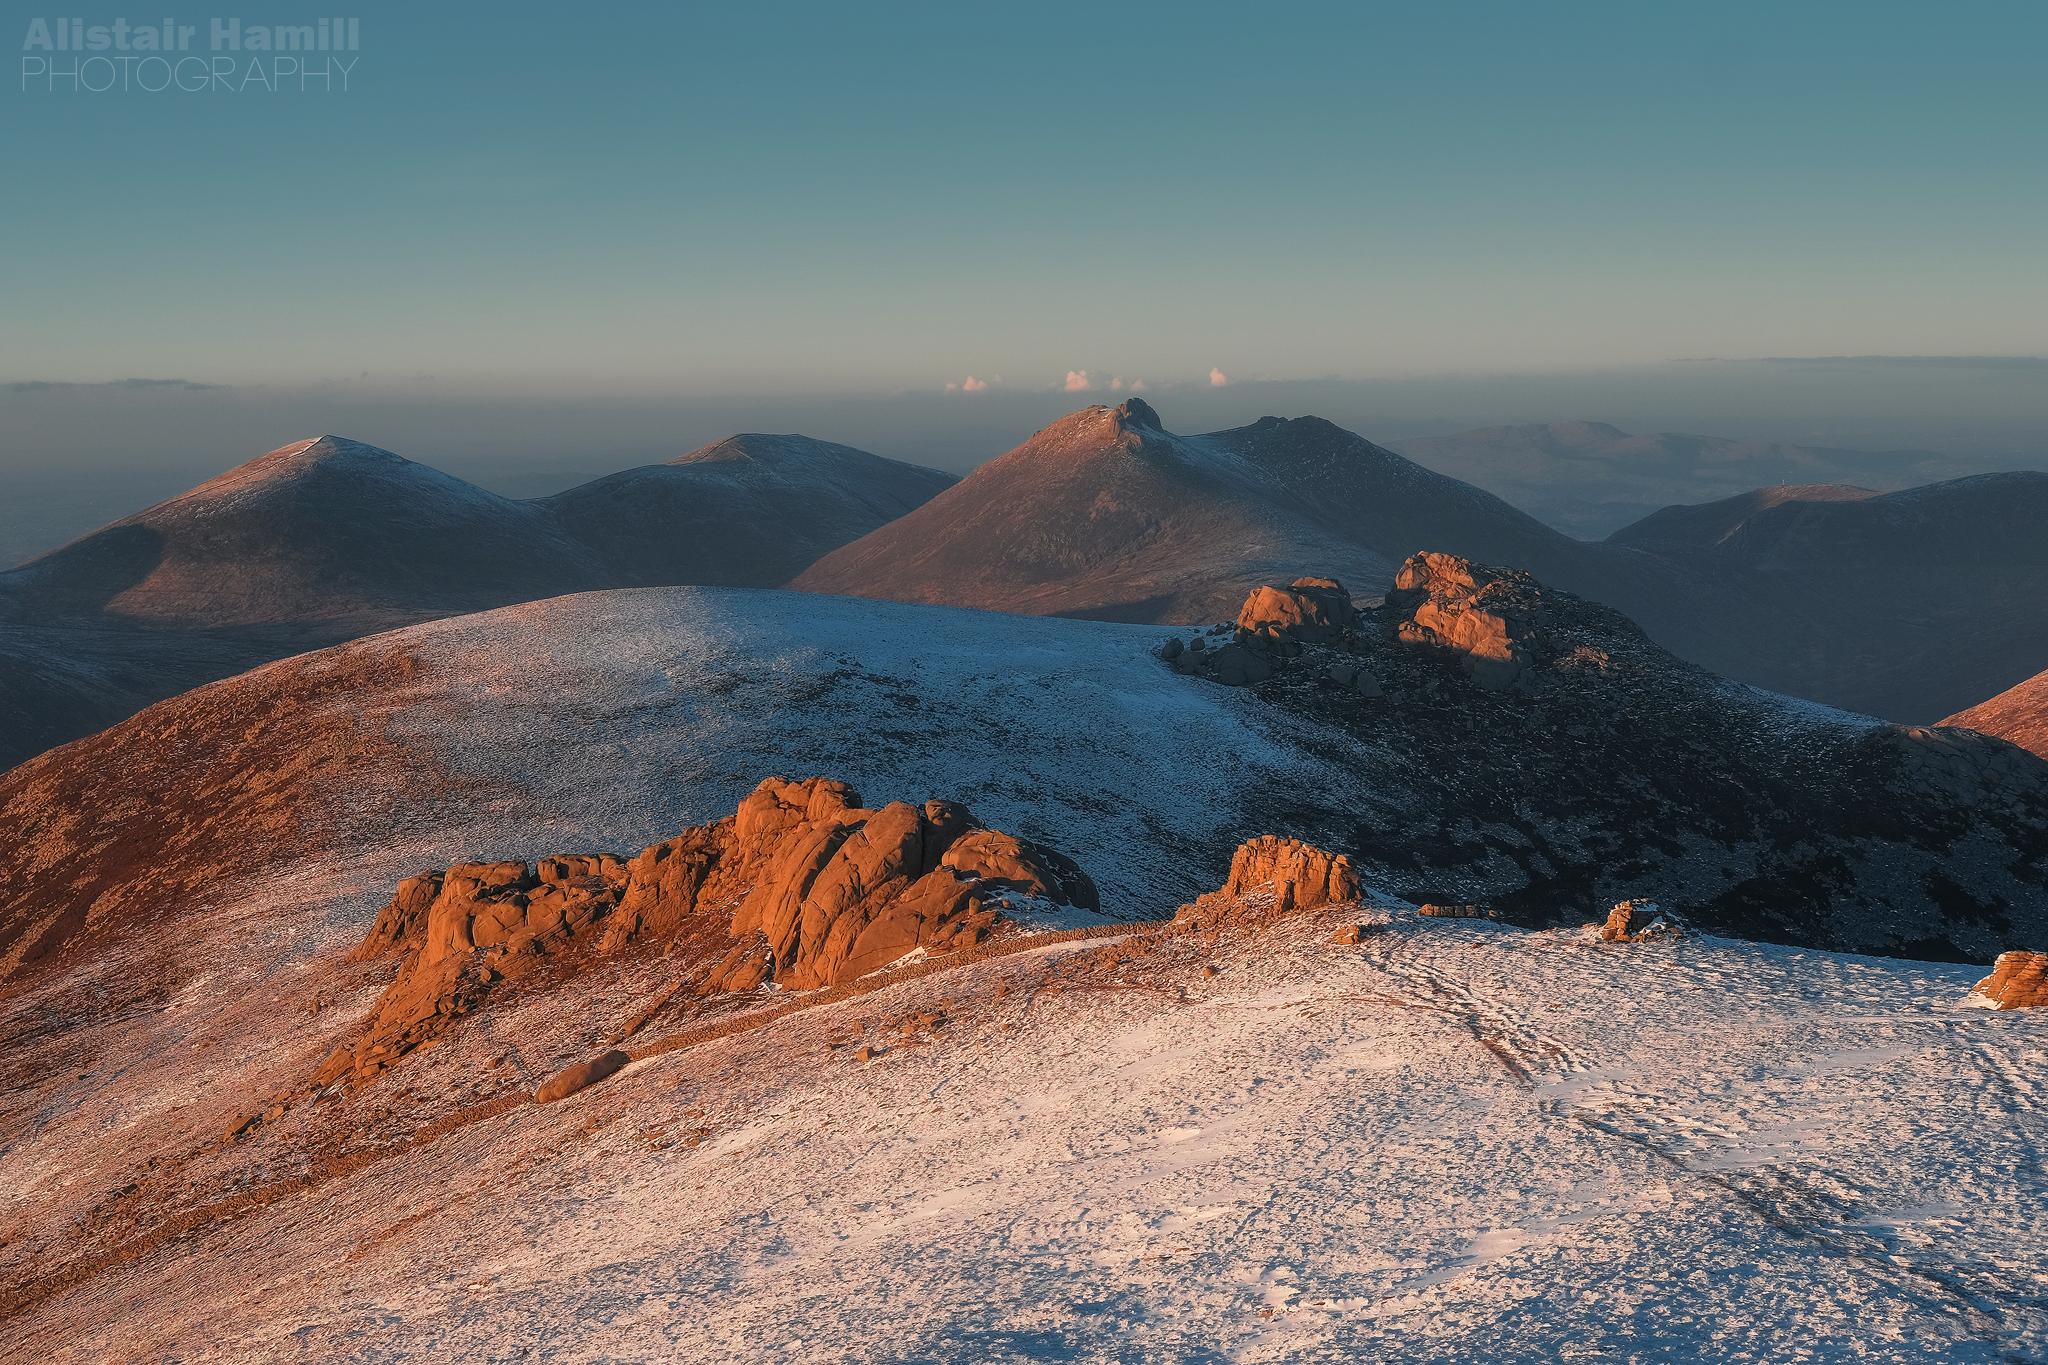 Binnian snow 2 (large) WM.jpg